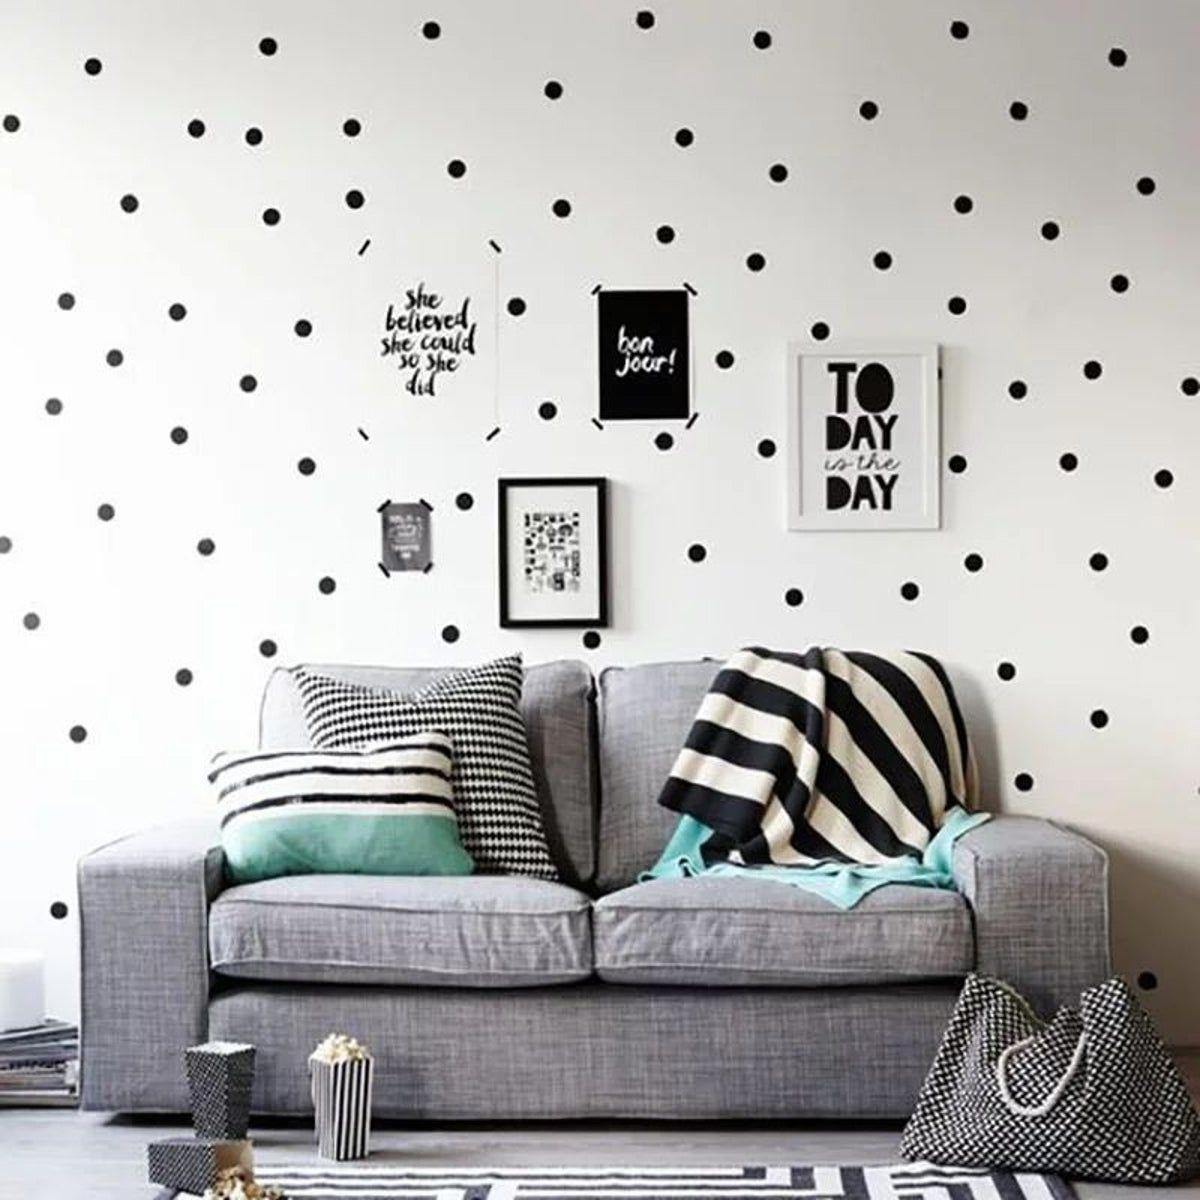 60 Count Black Polka Dot Wall Stickers Modern Baby Room Decor Childrens Room Wall Art Polka Dot Walls